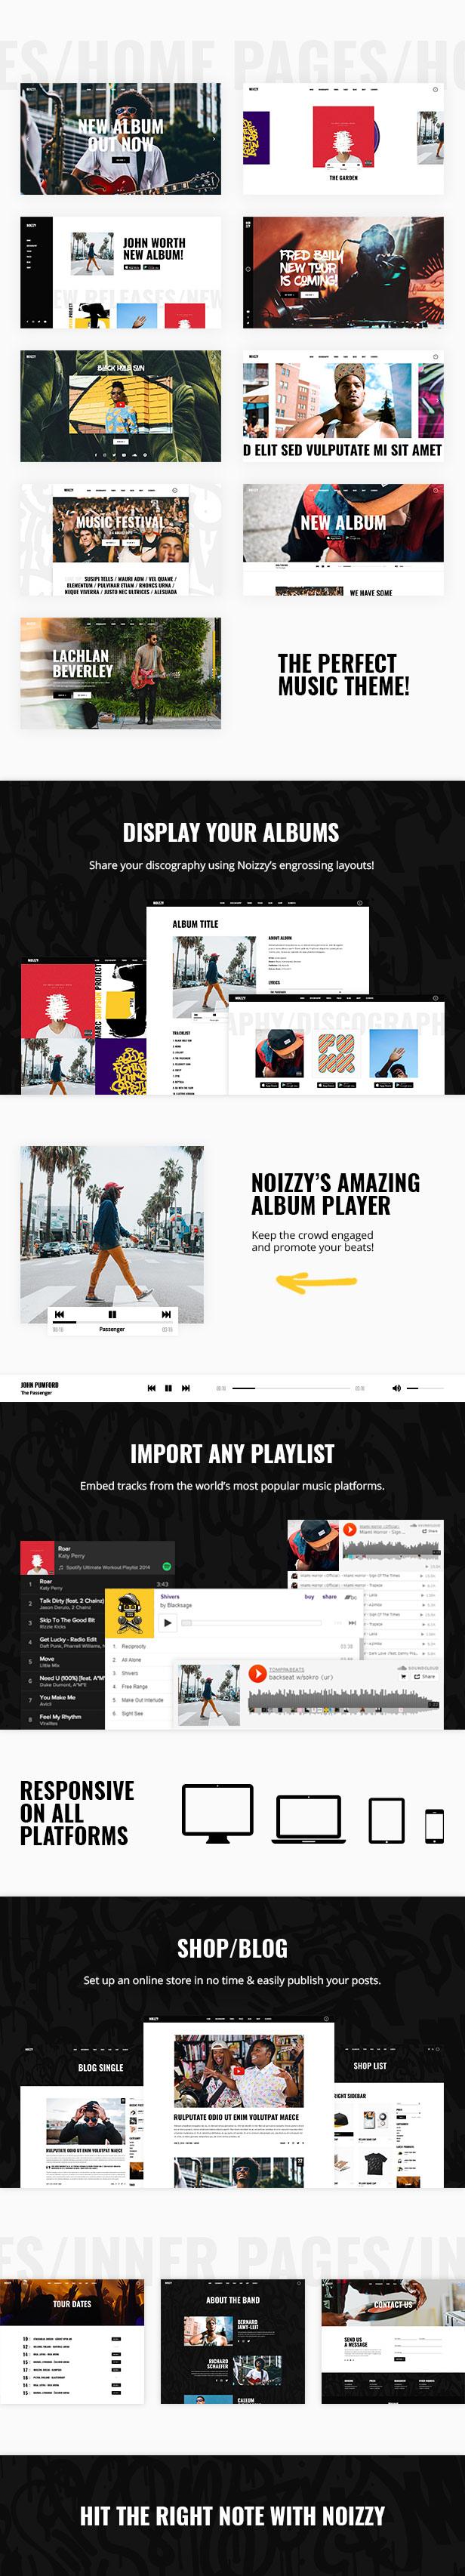 Noizzy - Music Theme - 1